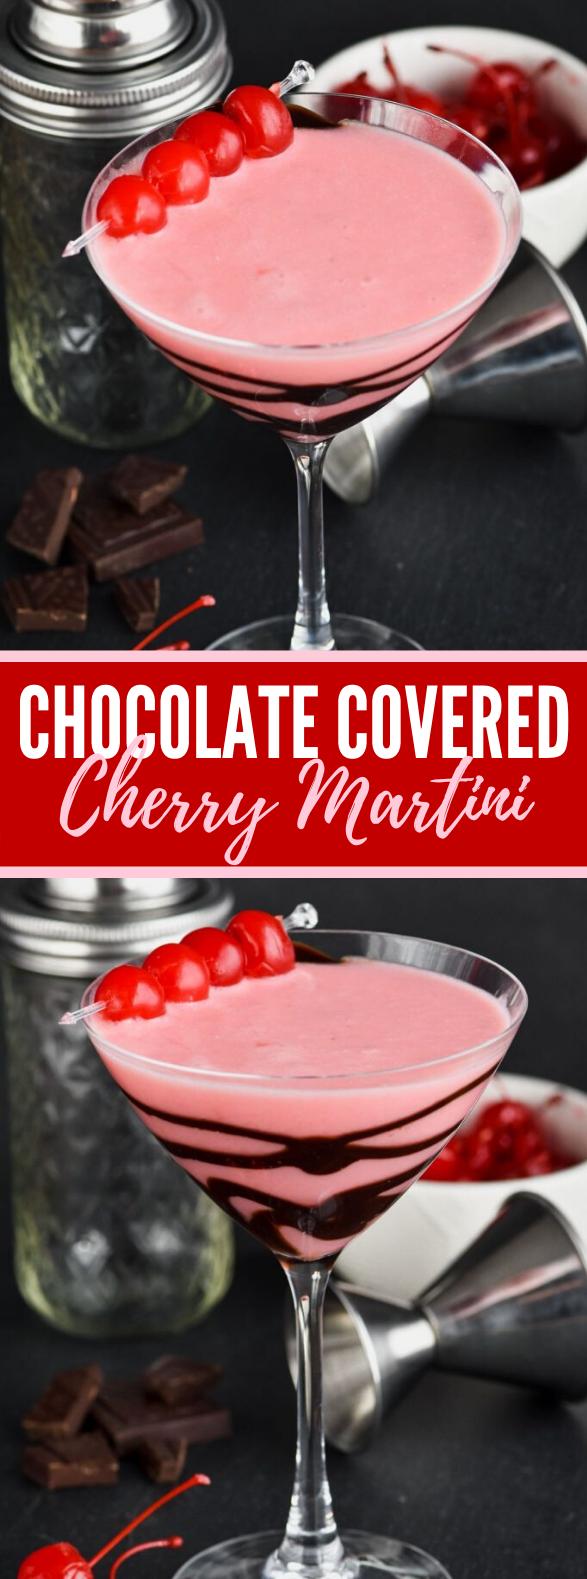 CHOCOLATE COVERED CHERRY MARTINI #drinks #vodka